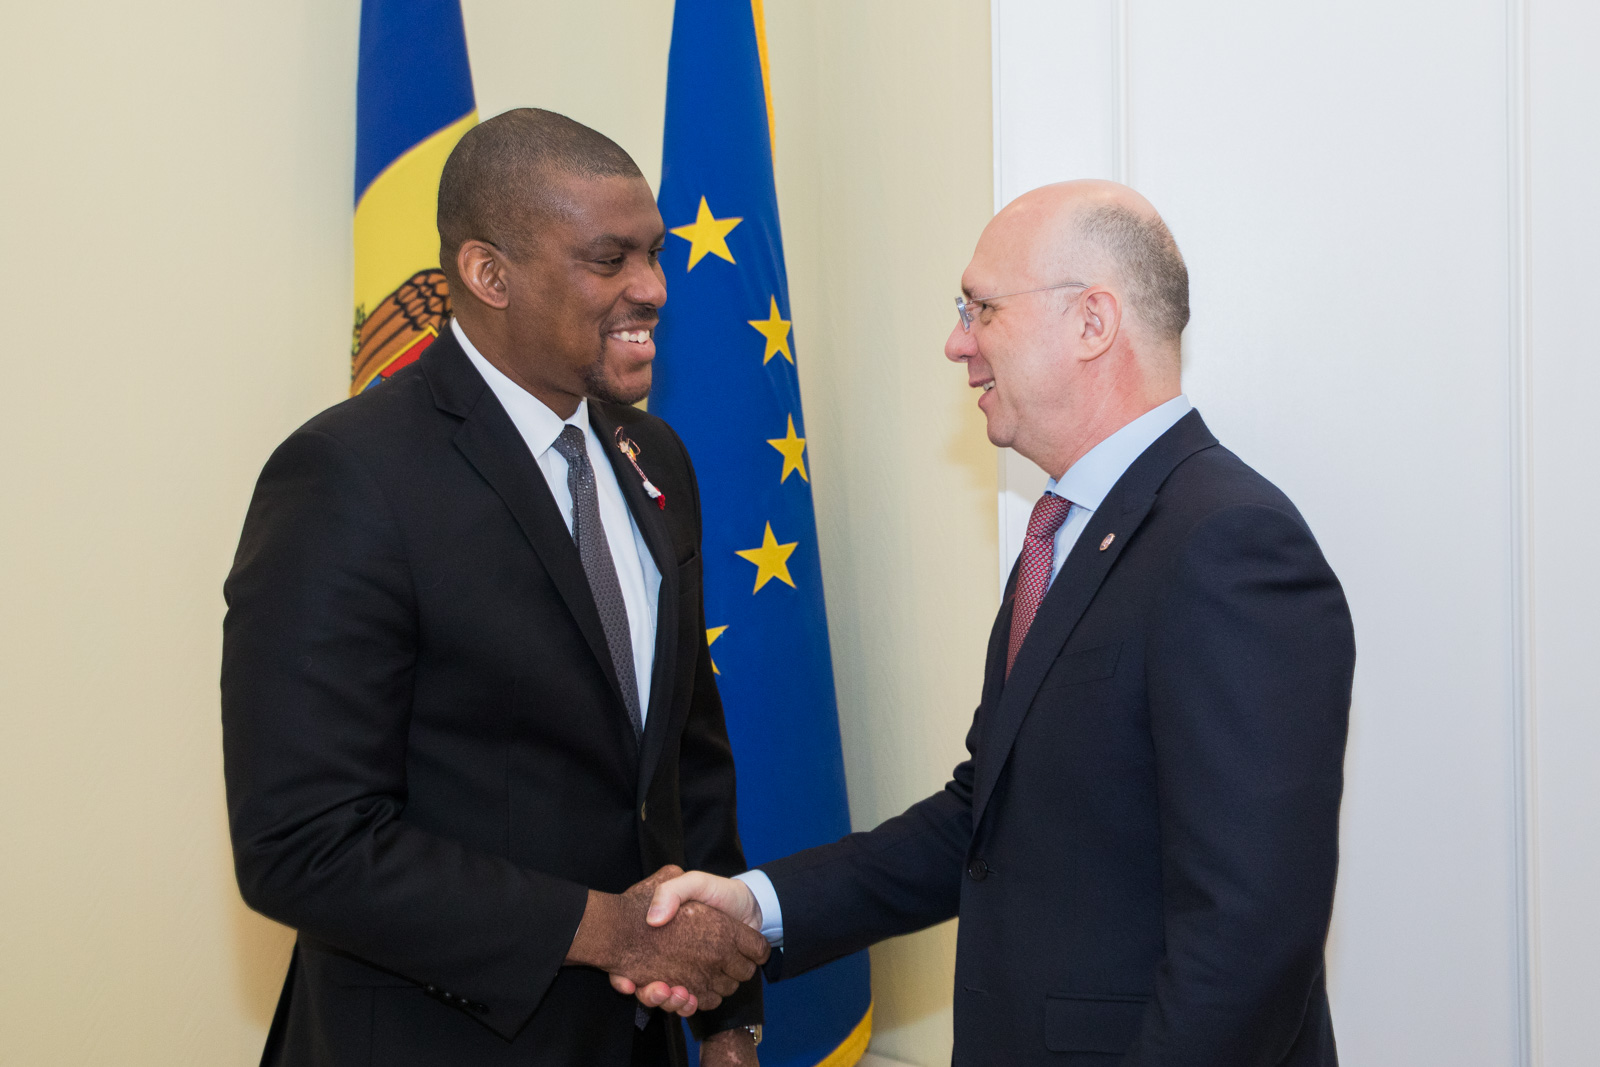 ambasada sua in moldova, dereck hogan, guvernul pdm, guvernul filip, dialog moldo-american, guvenrul republicii moldova